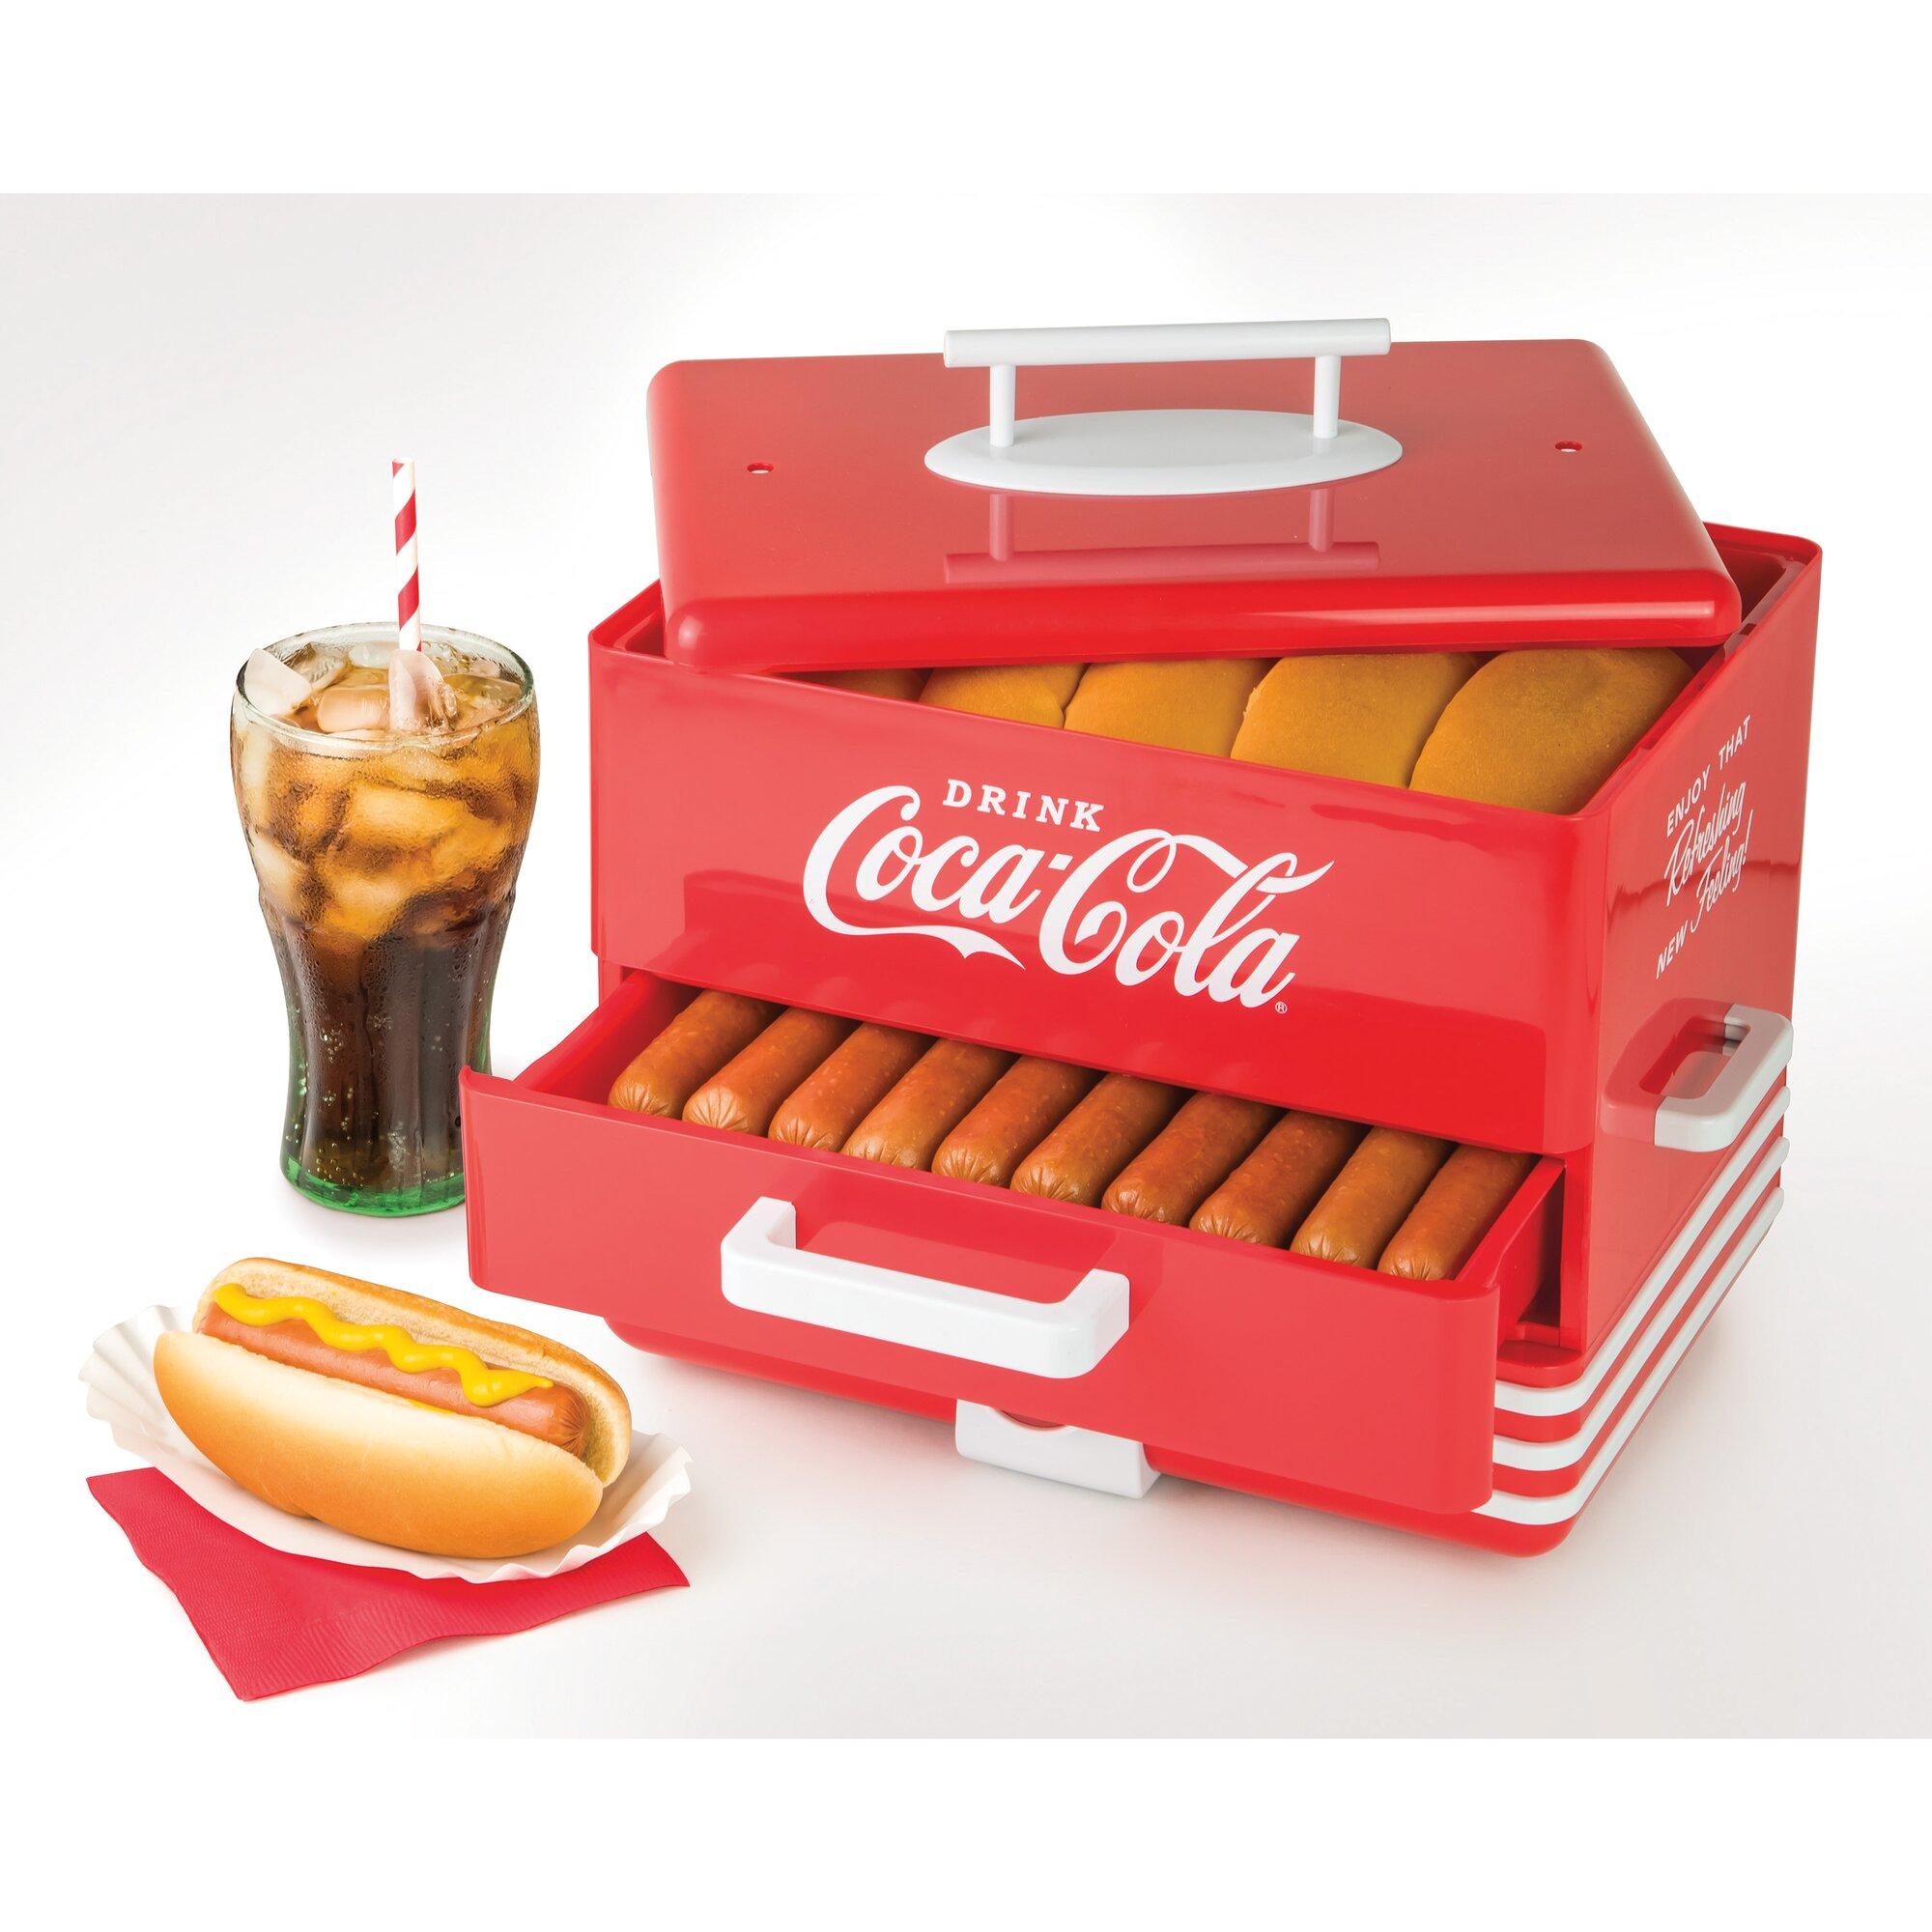 Uncategorized Hot Dog Cookers Specialty Kitchen Liances Nostalgia Electrics Coca Cola Series Steamer Reviews